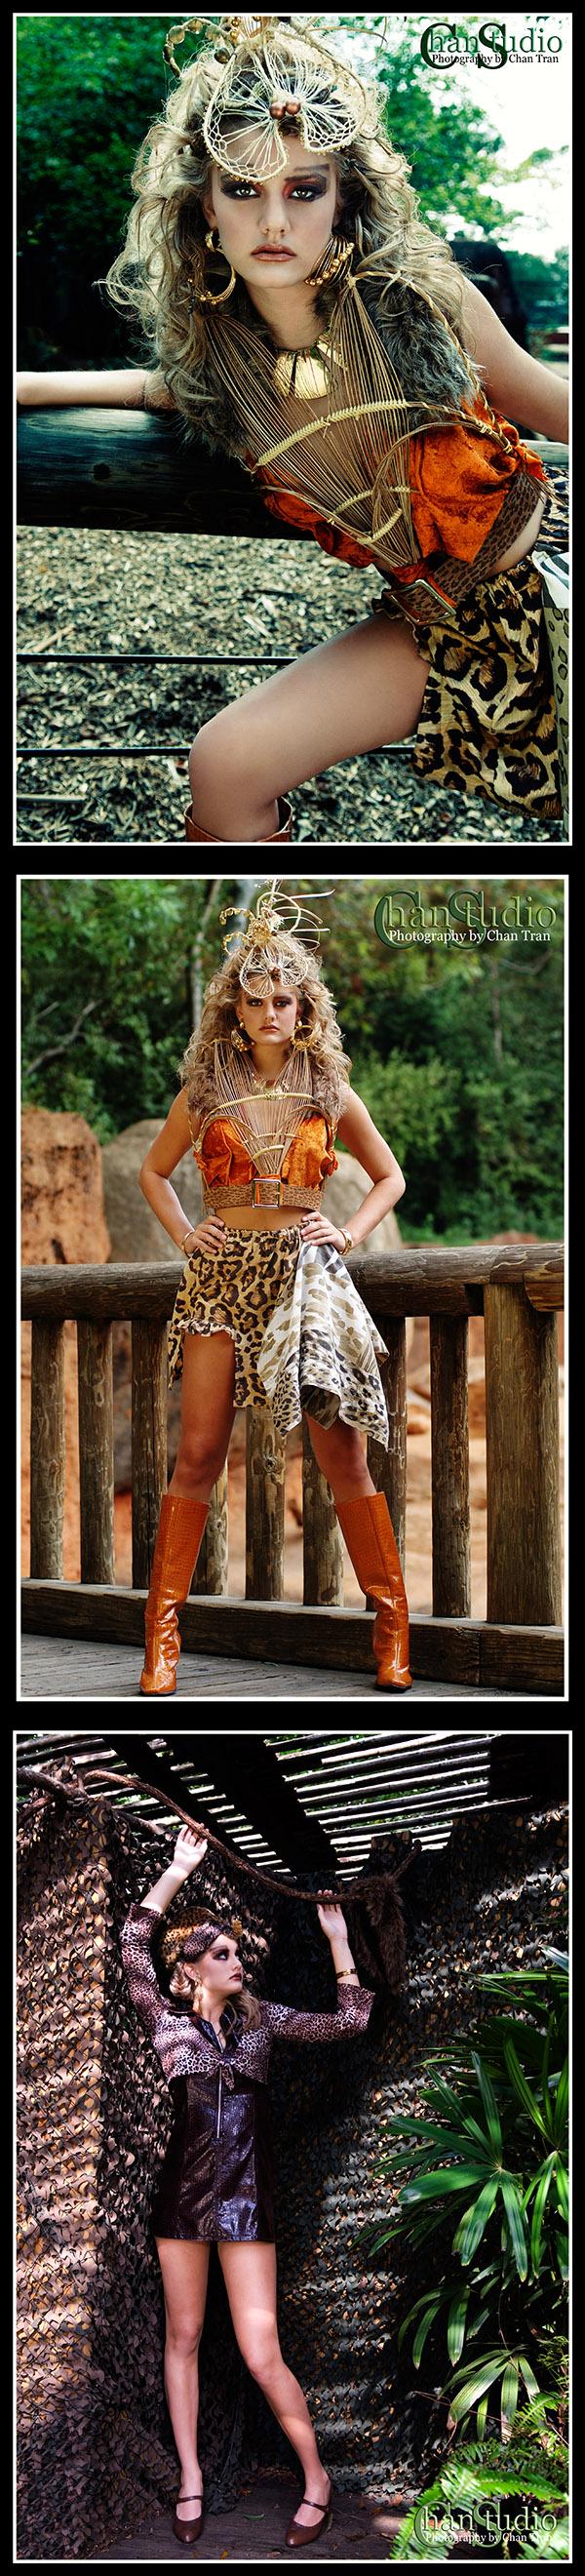 Atlanta zoo (Jungle for Jungle theme) Sep 25, 2007 ChanStudio Jungle Queen. (Agency represented, Click).